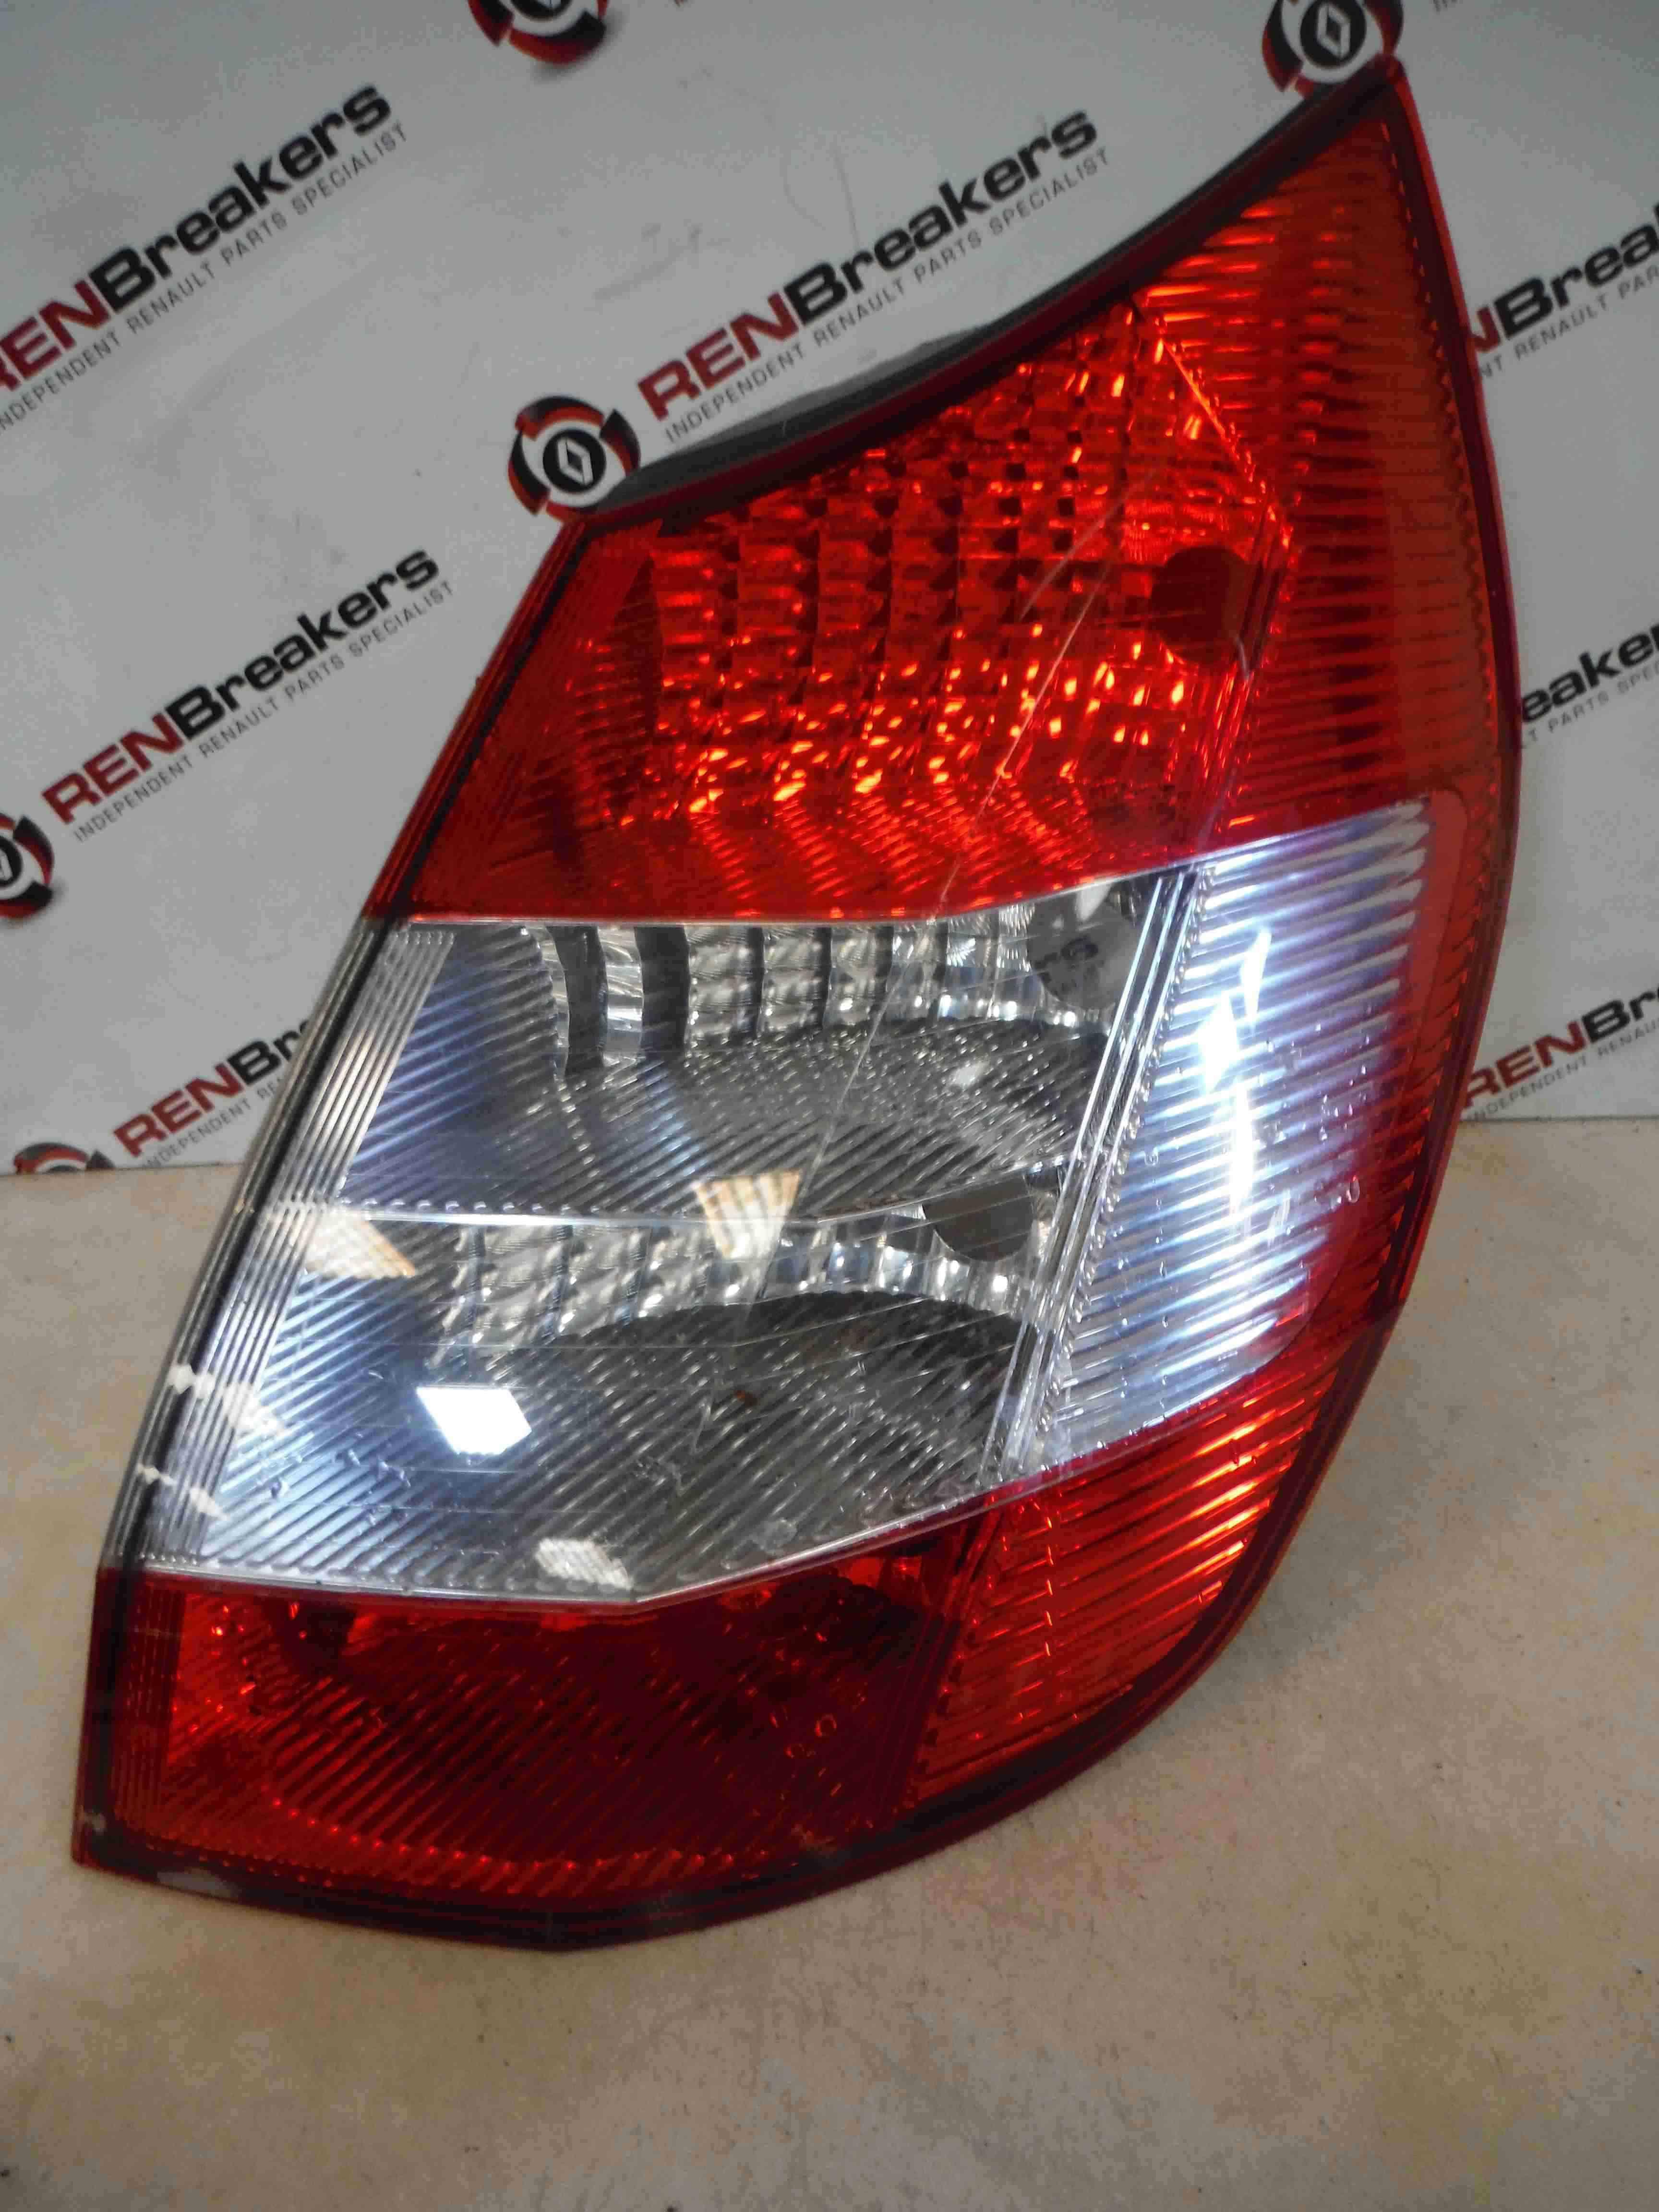 Renault Megane Scenic 2003-2009 Drivers OSR Rear Light Clear Lens 8200493375